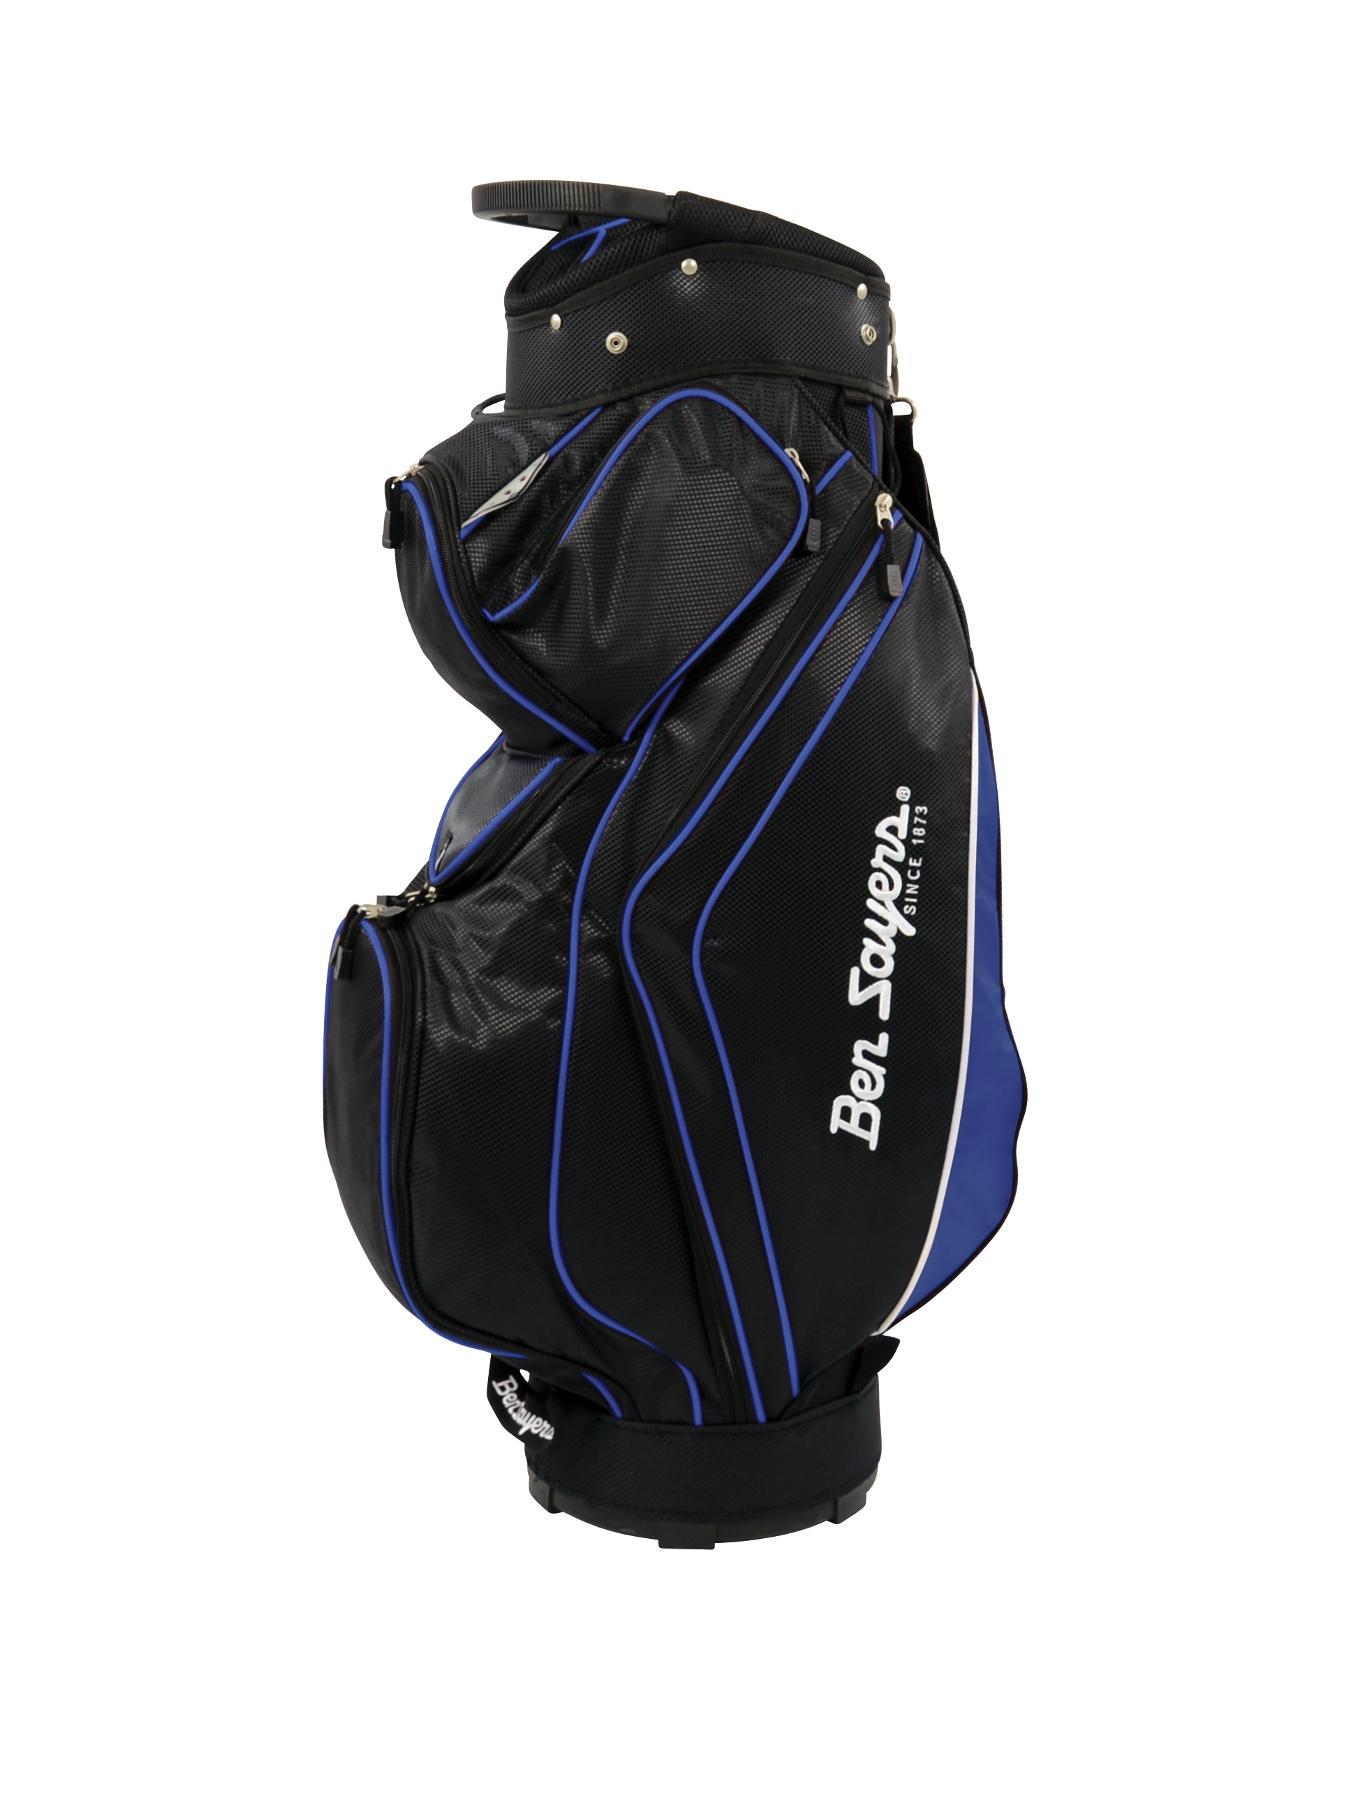 X-Lite Stand Bag, Black